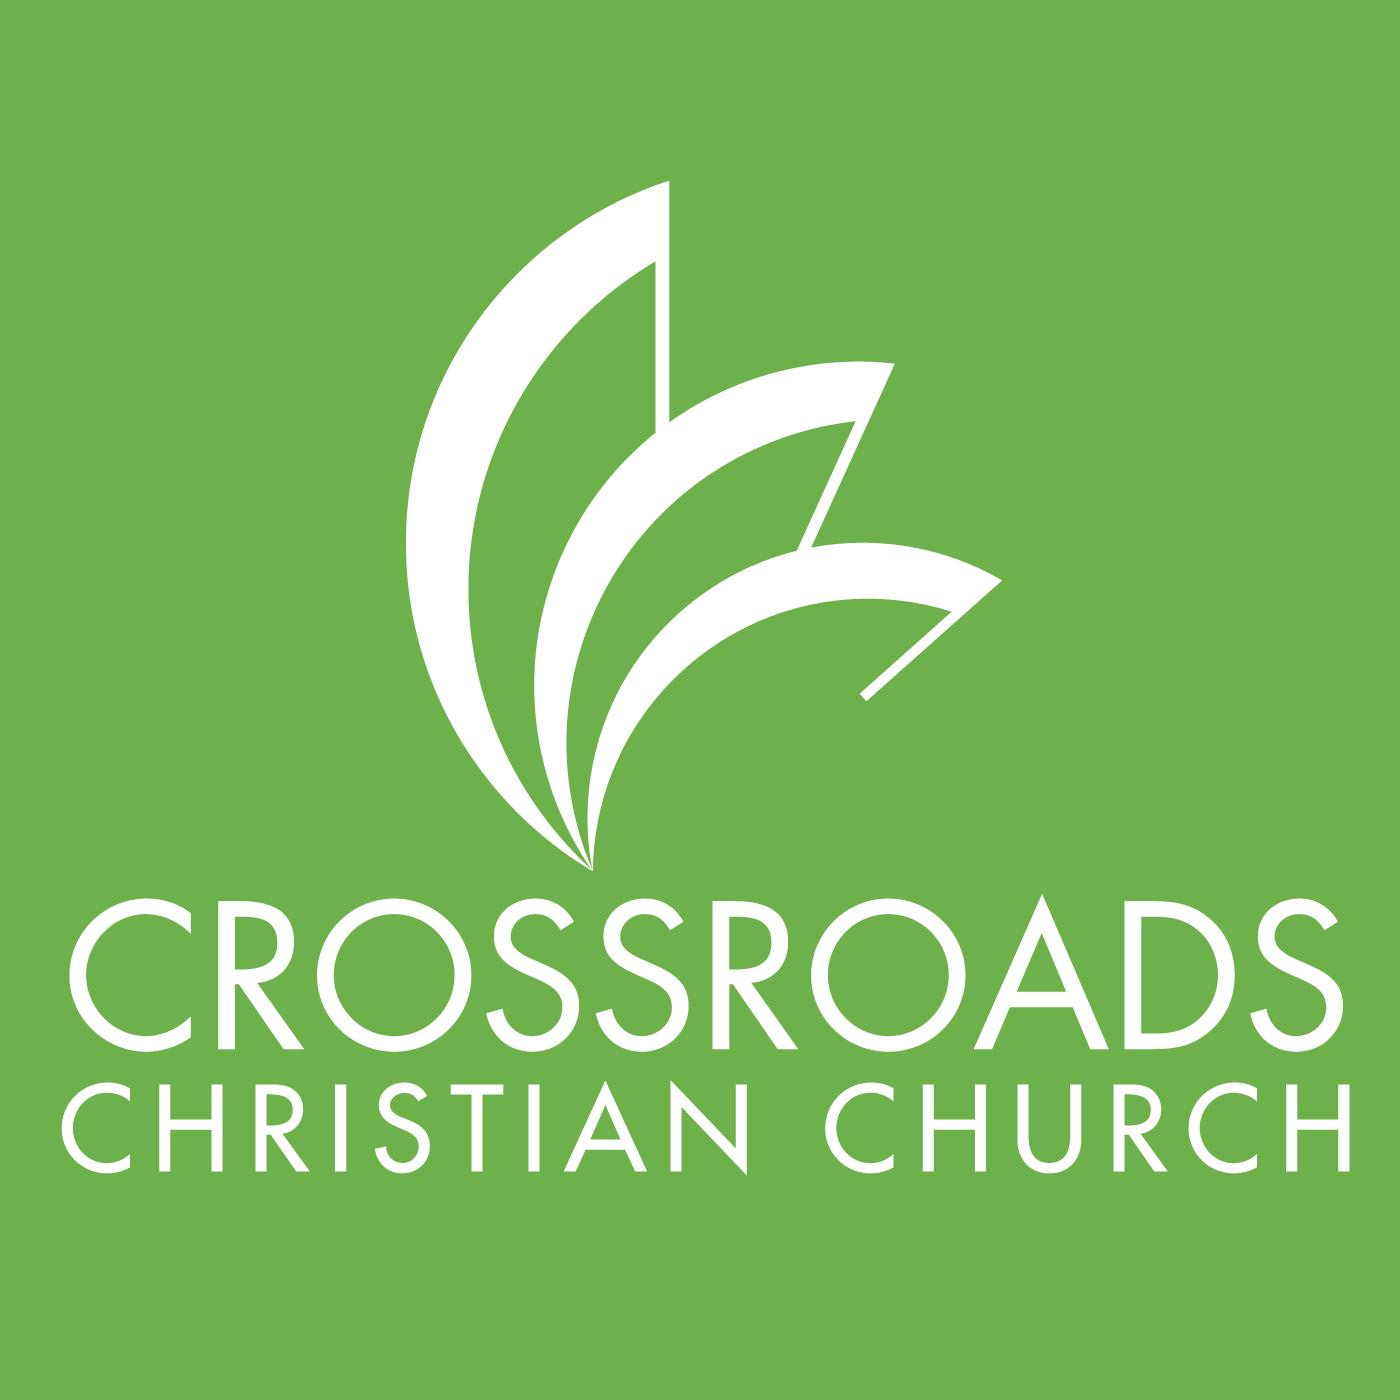 Crossroads Christian Church, KY